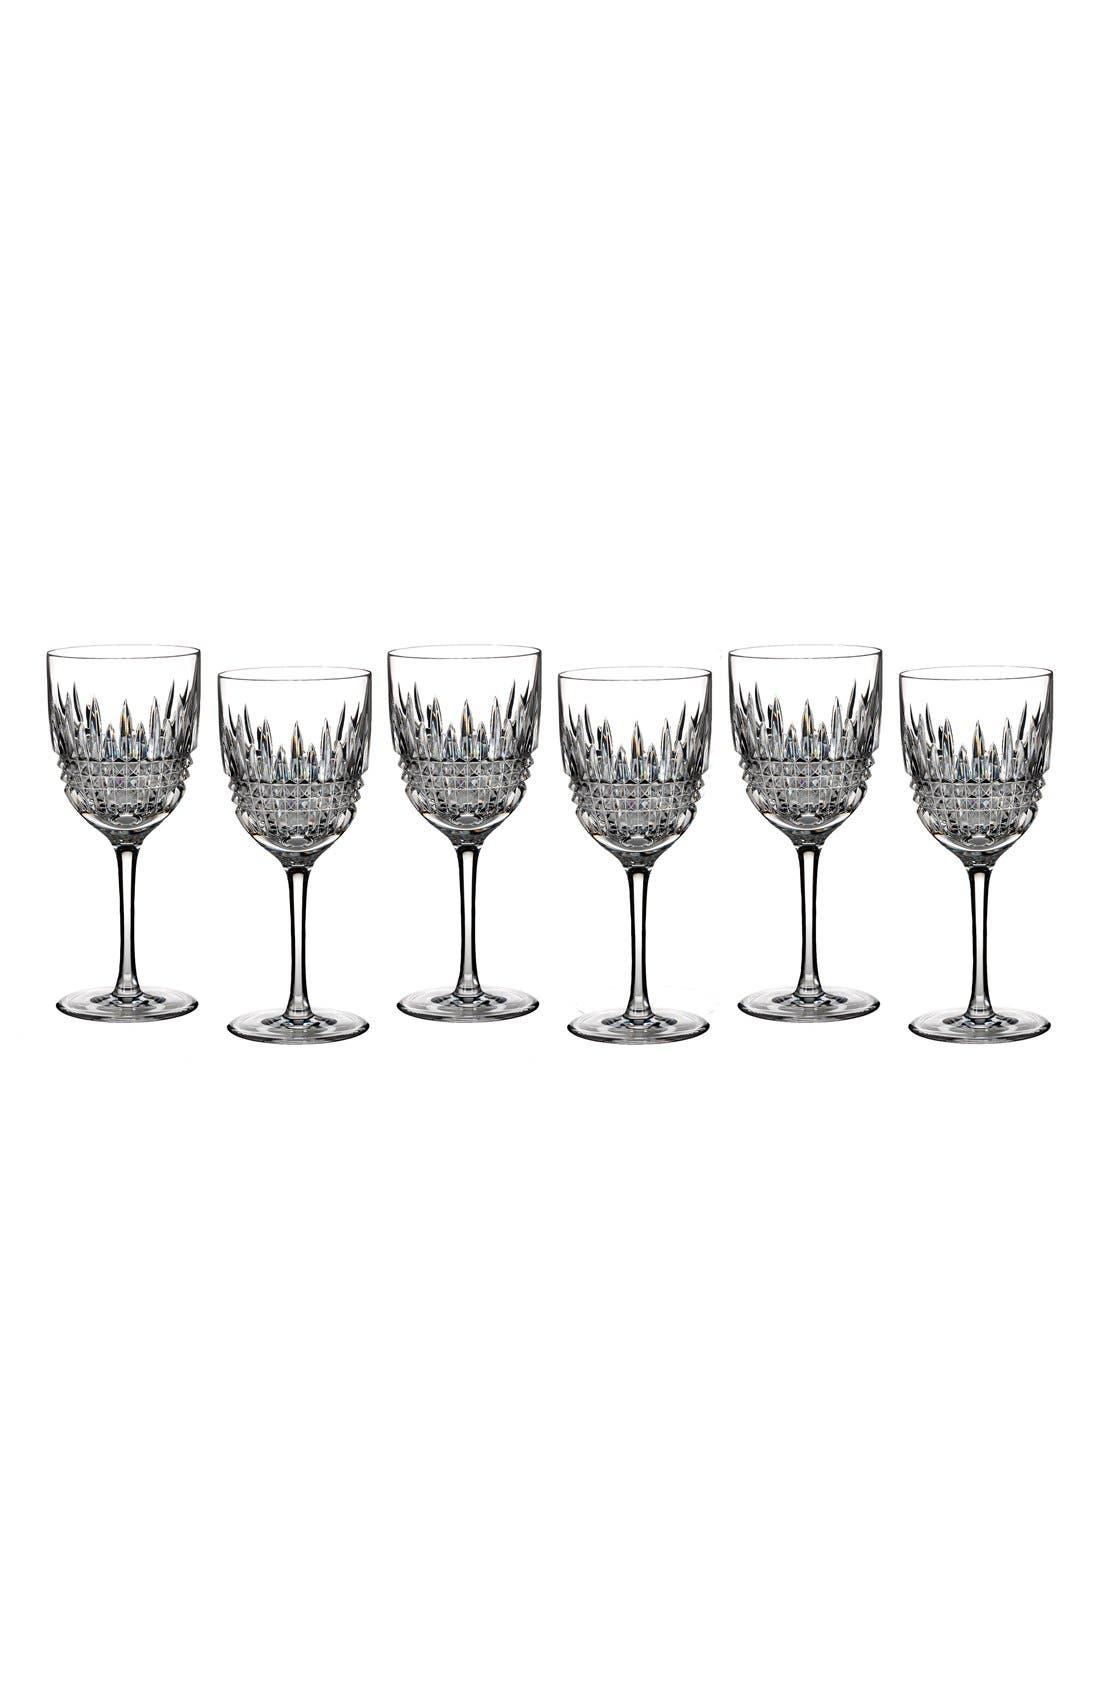 Alternate Image 1 Selected - Waterford Lismore Diamond Set of 6 Lead Crystal White Wine Glasses